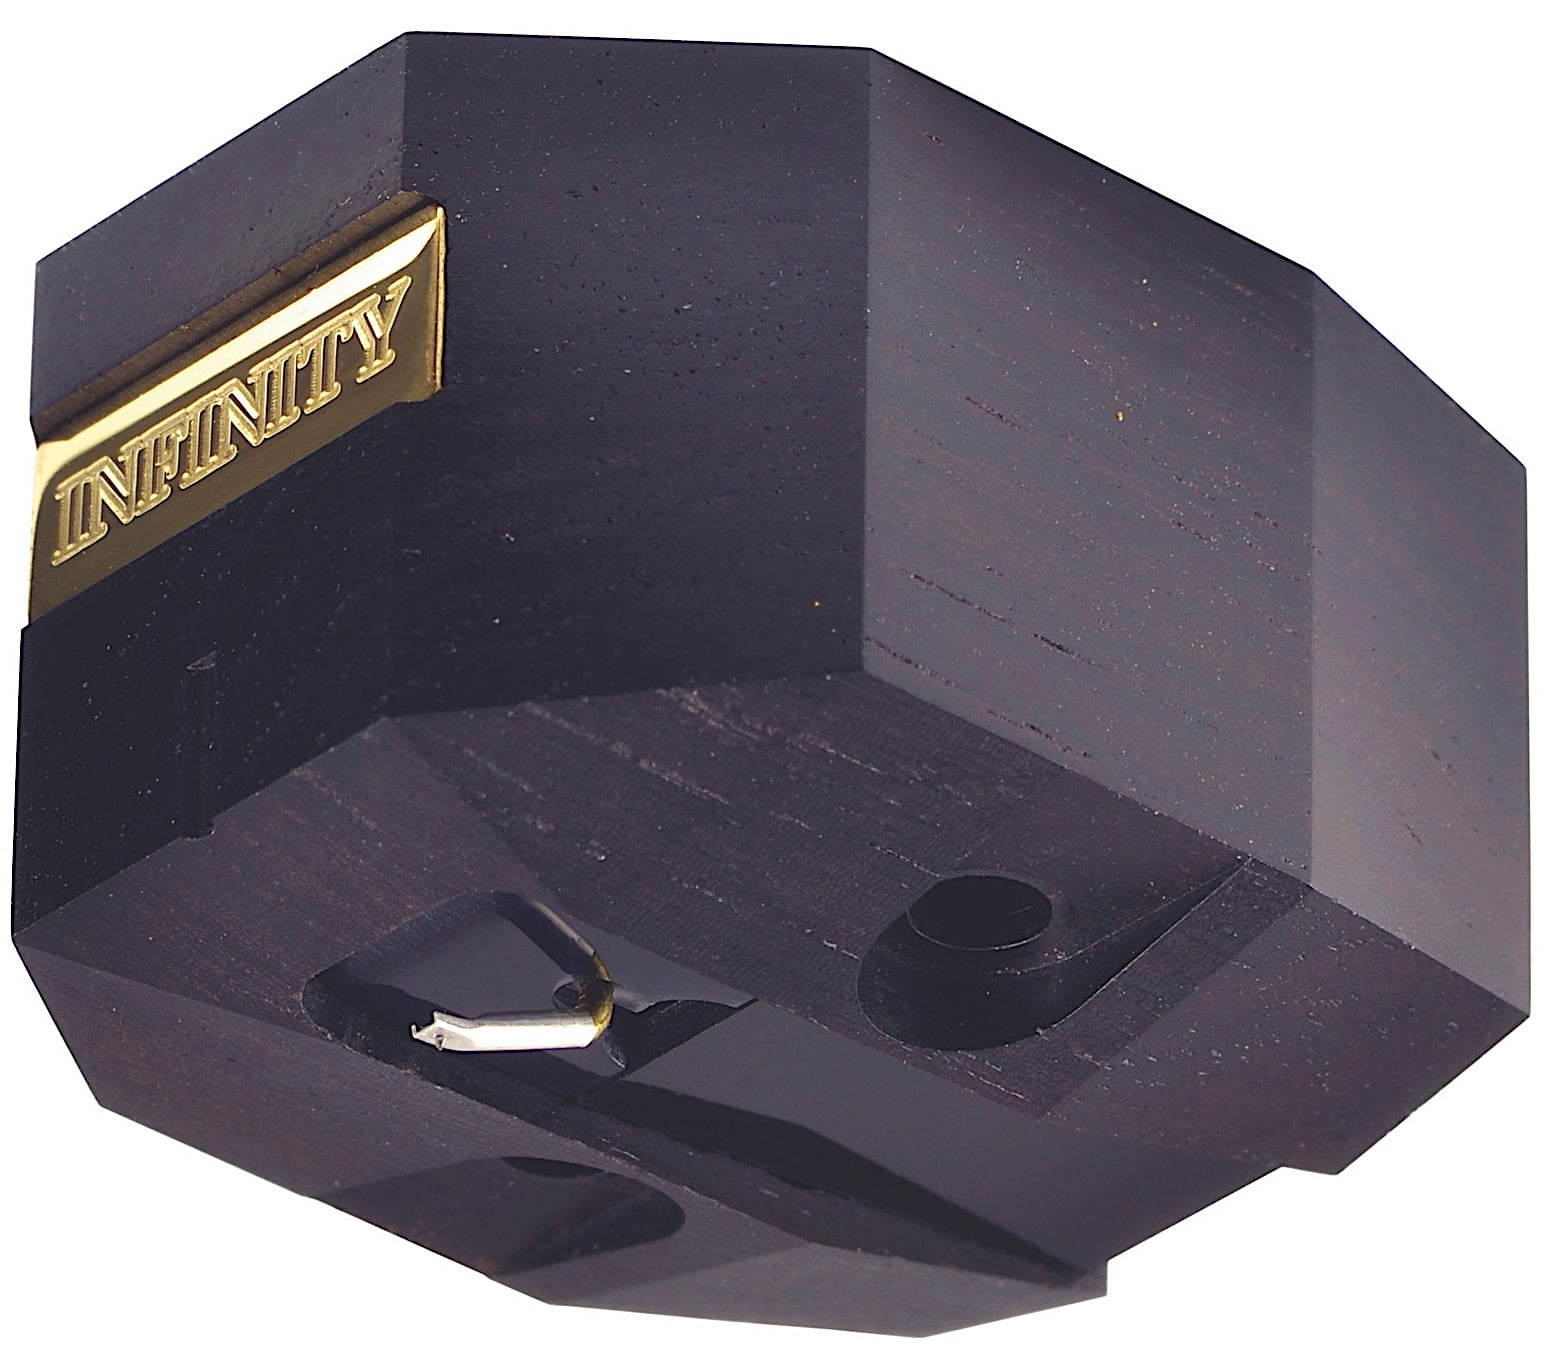 Infinity Mono cartridge From Miyajima - The Audiophile Man